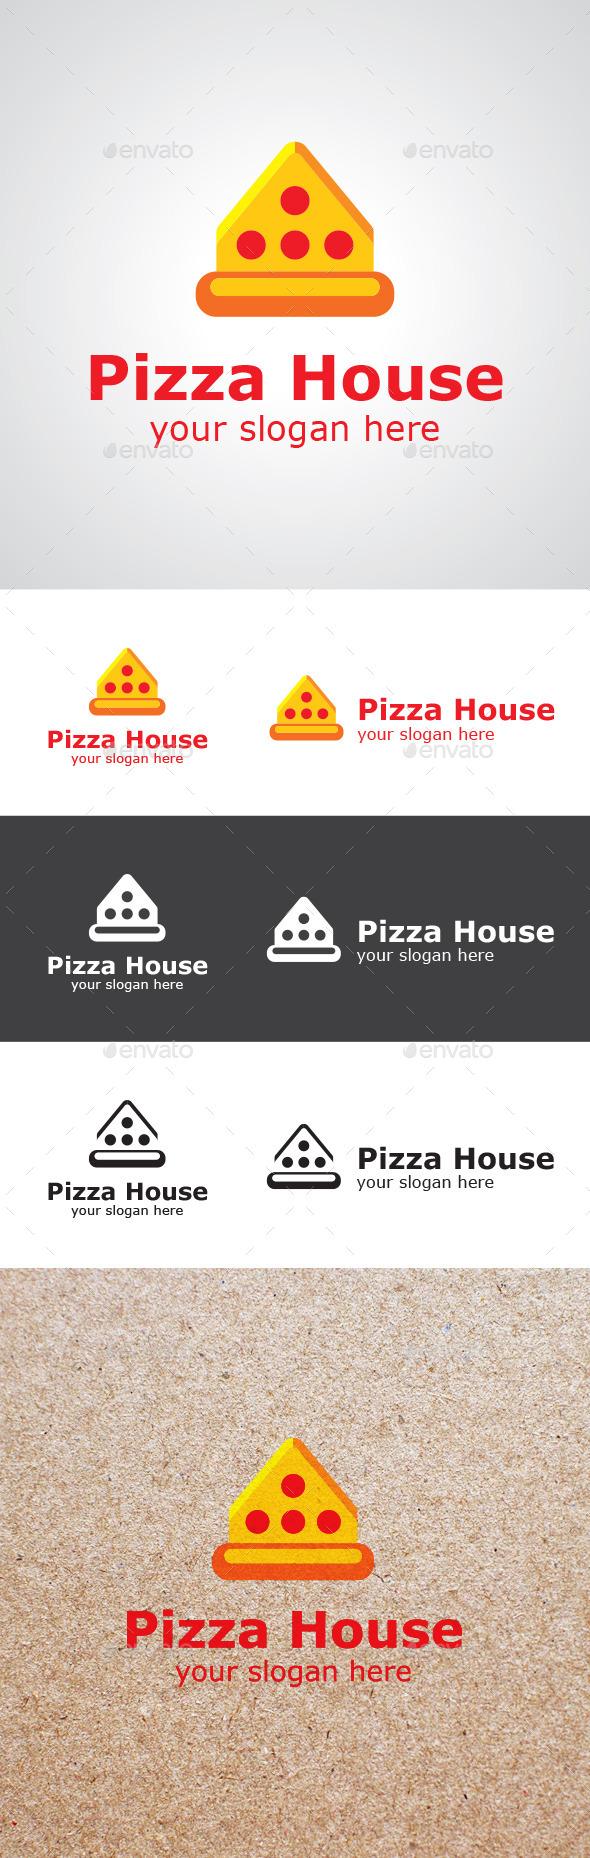 Pizza House Logo Design